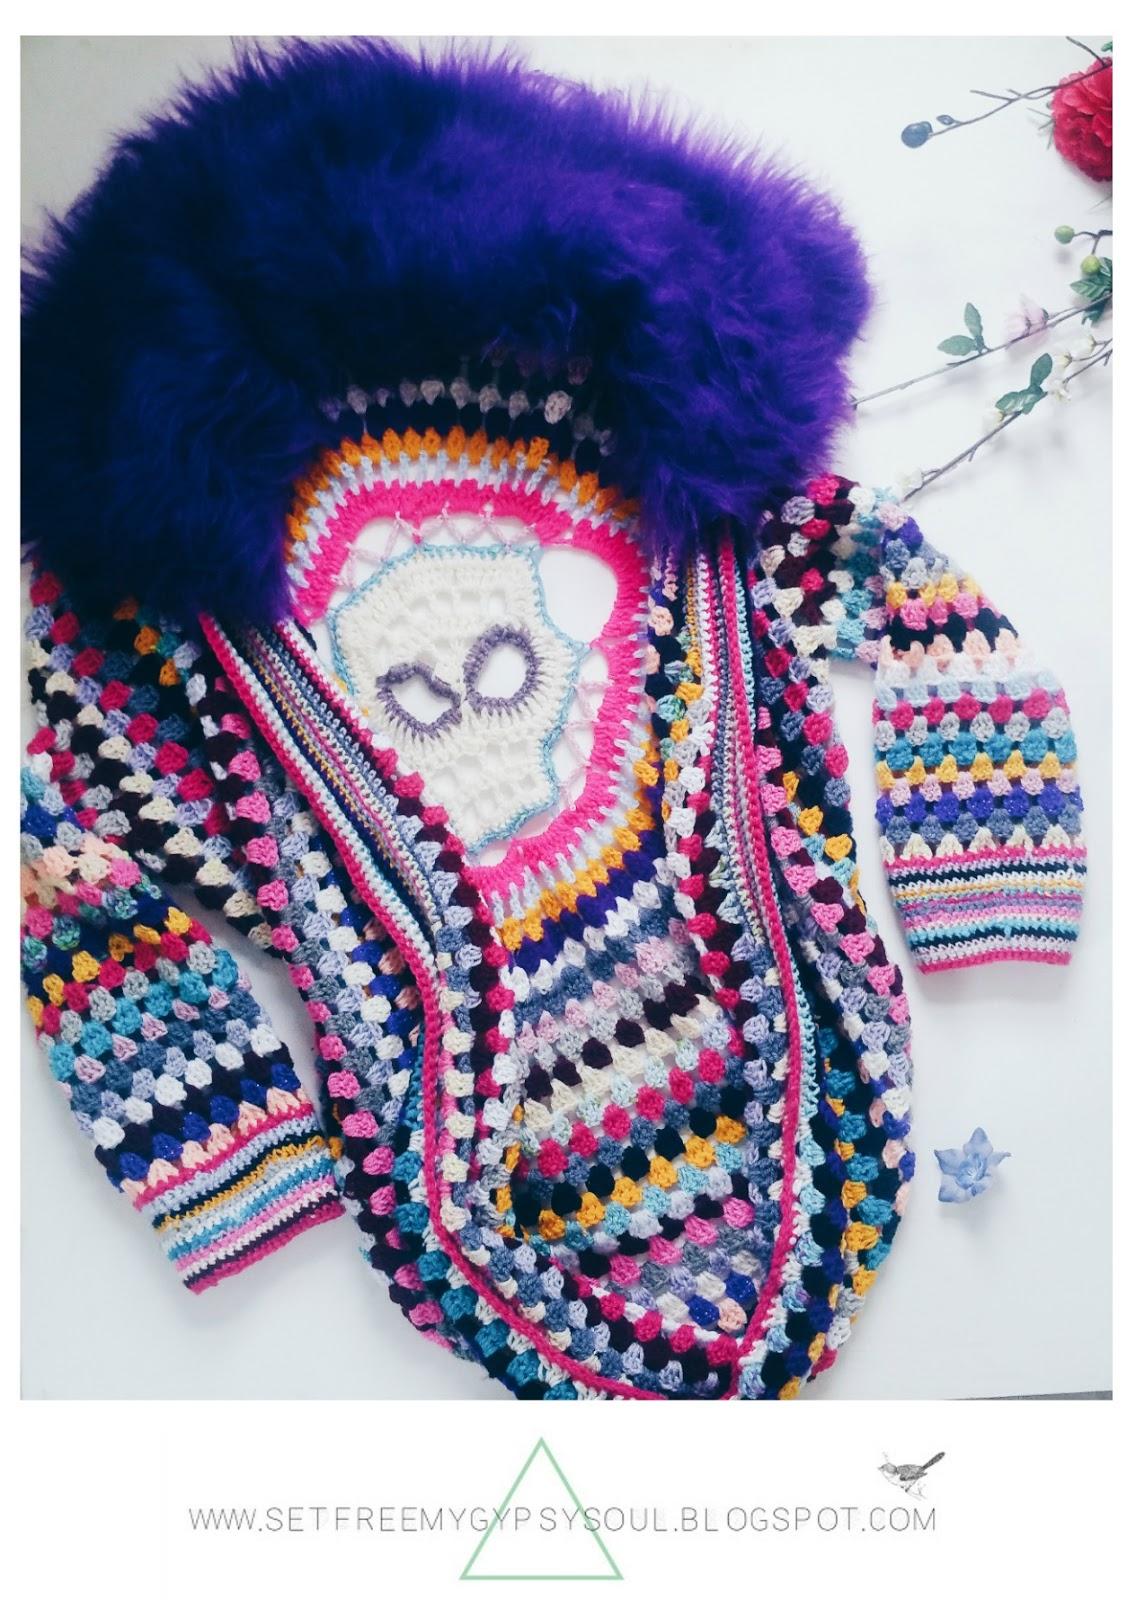 skull crochet cardigan freeform free pattern